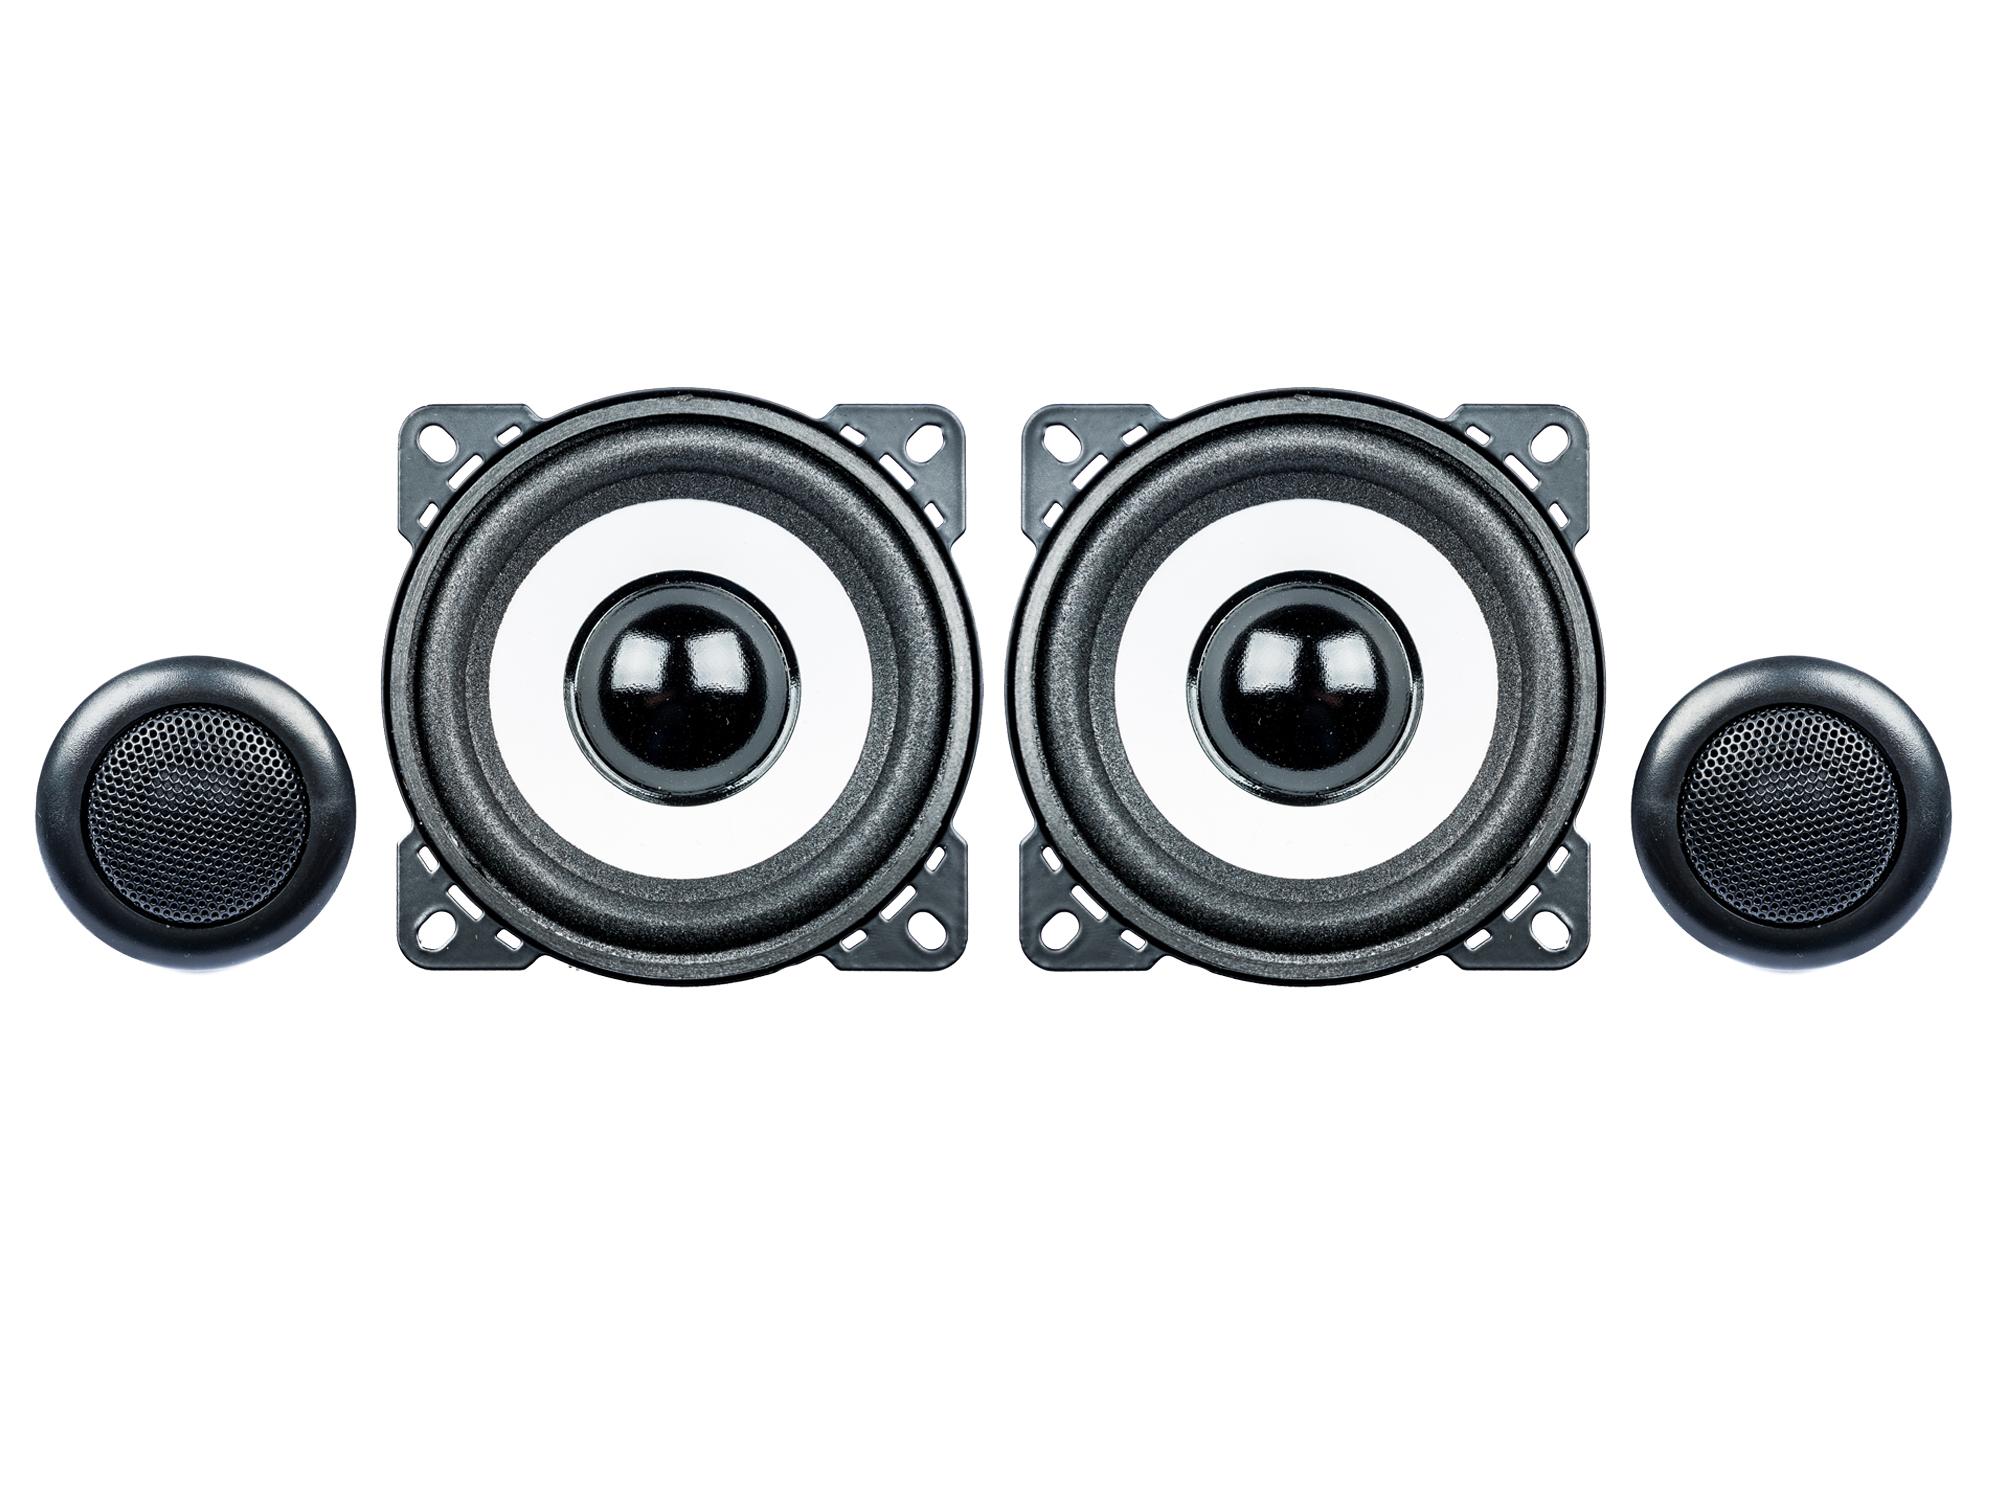 PG Audio Evo II 2.10 Kompo Lautsprecher 10 cm max. 160 Watt,100 mm 1 Paar – Bild 1